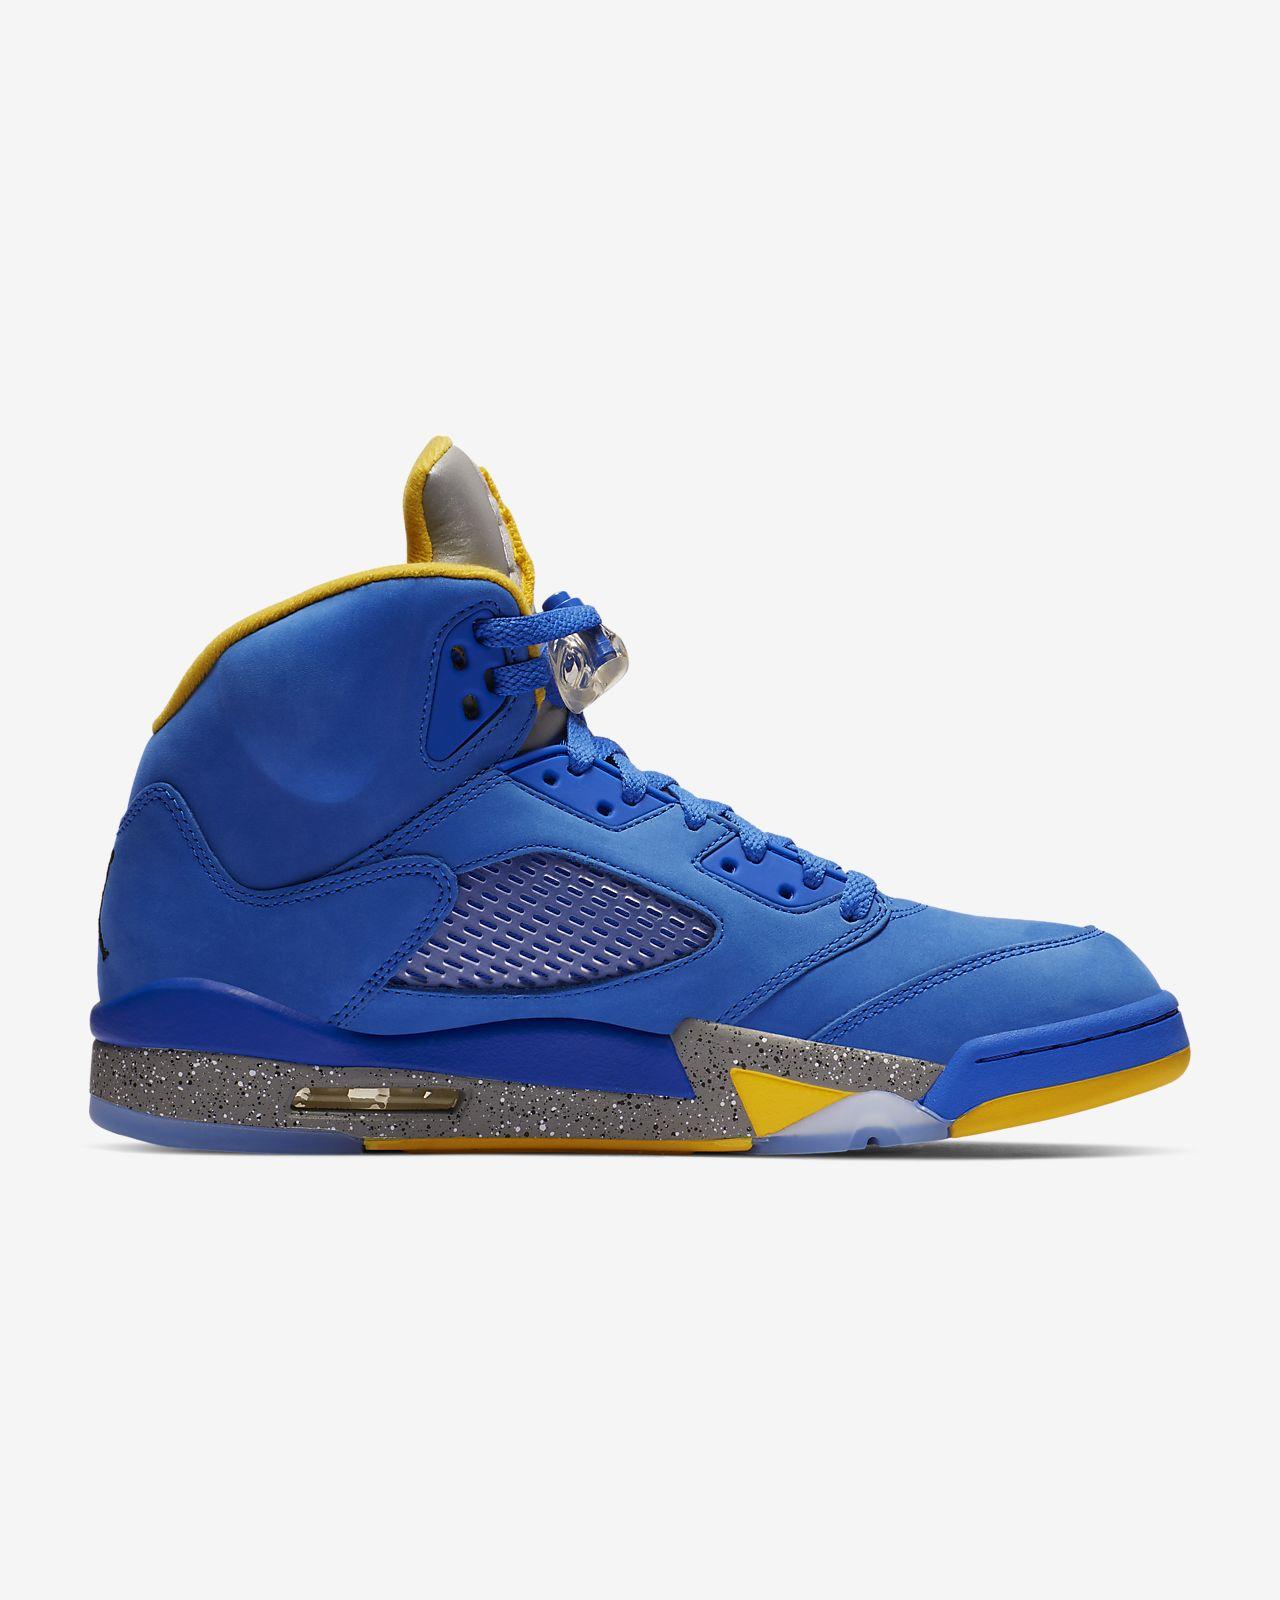 best website 9d5f0 cb4f0 ... Air Jordan 5 Laney JSP Men s Shoe